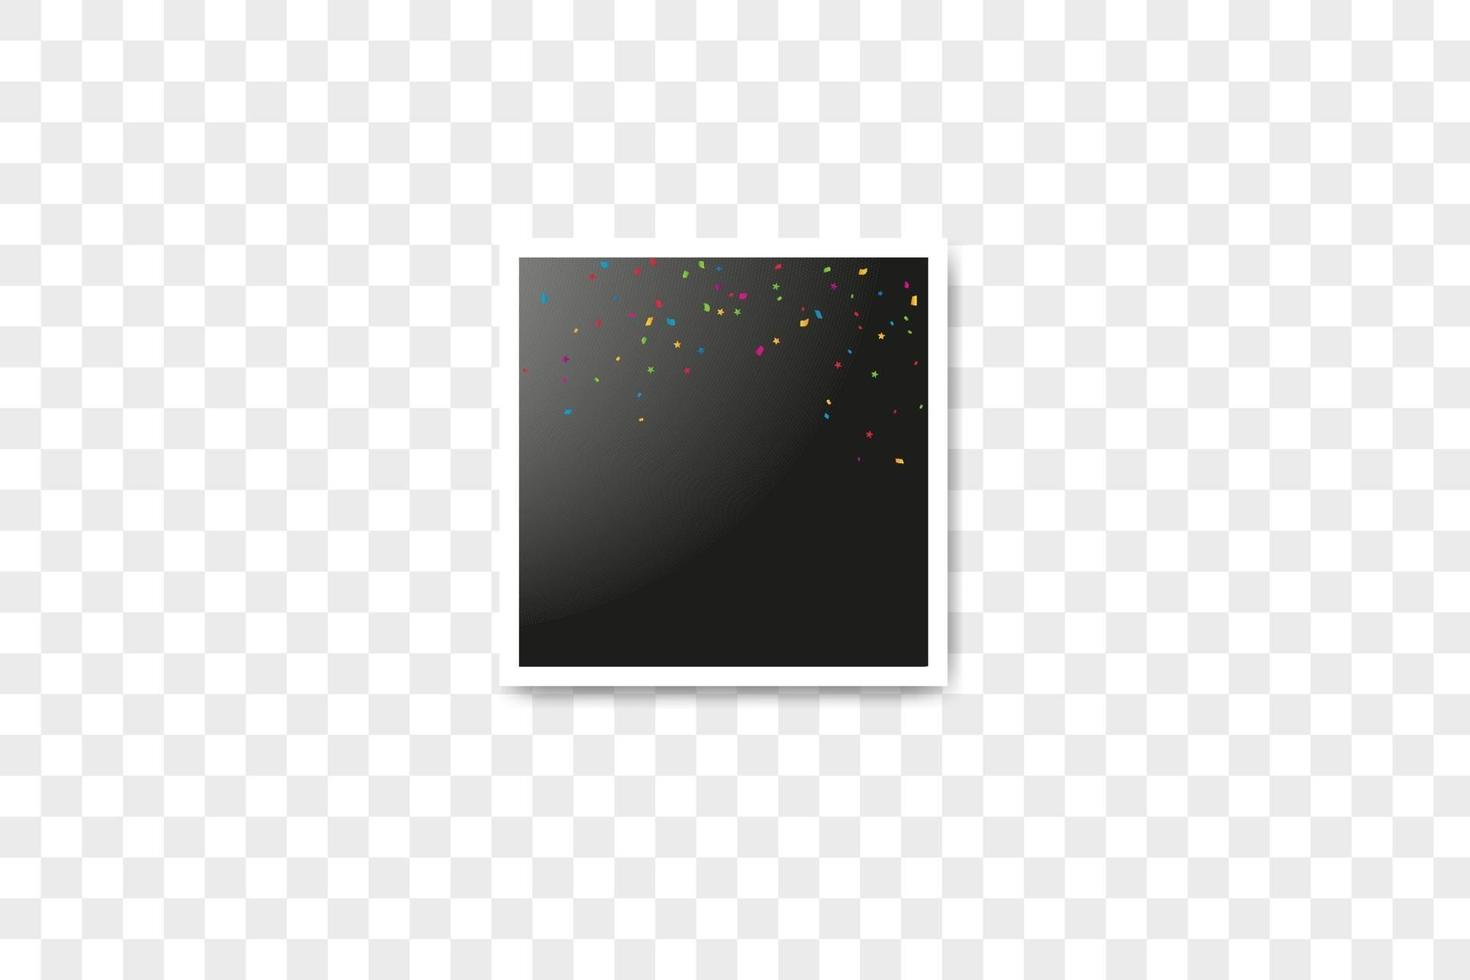 vector frames fotocollage en kleursamenstelling van vector realistische confetti